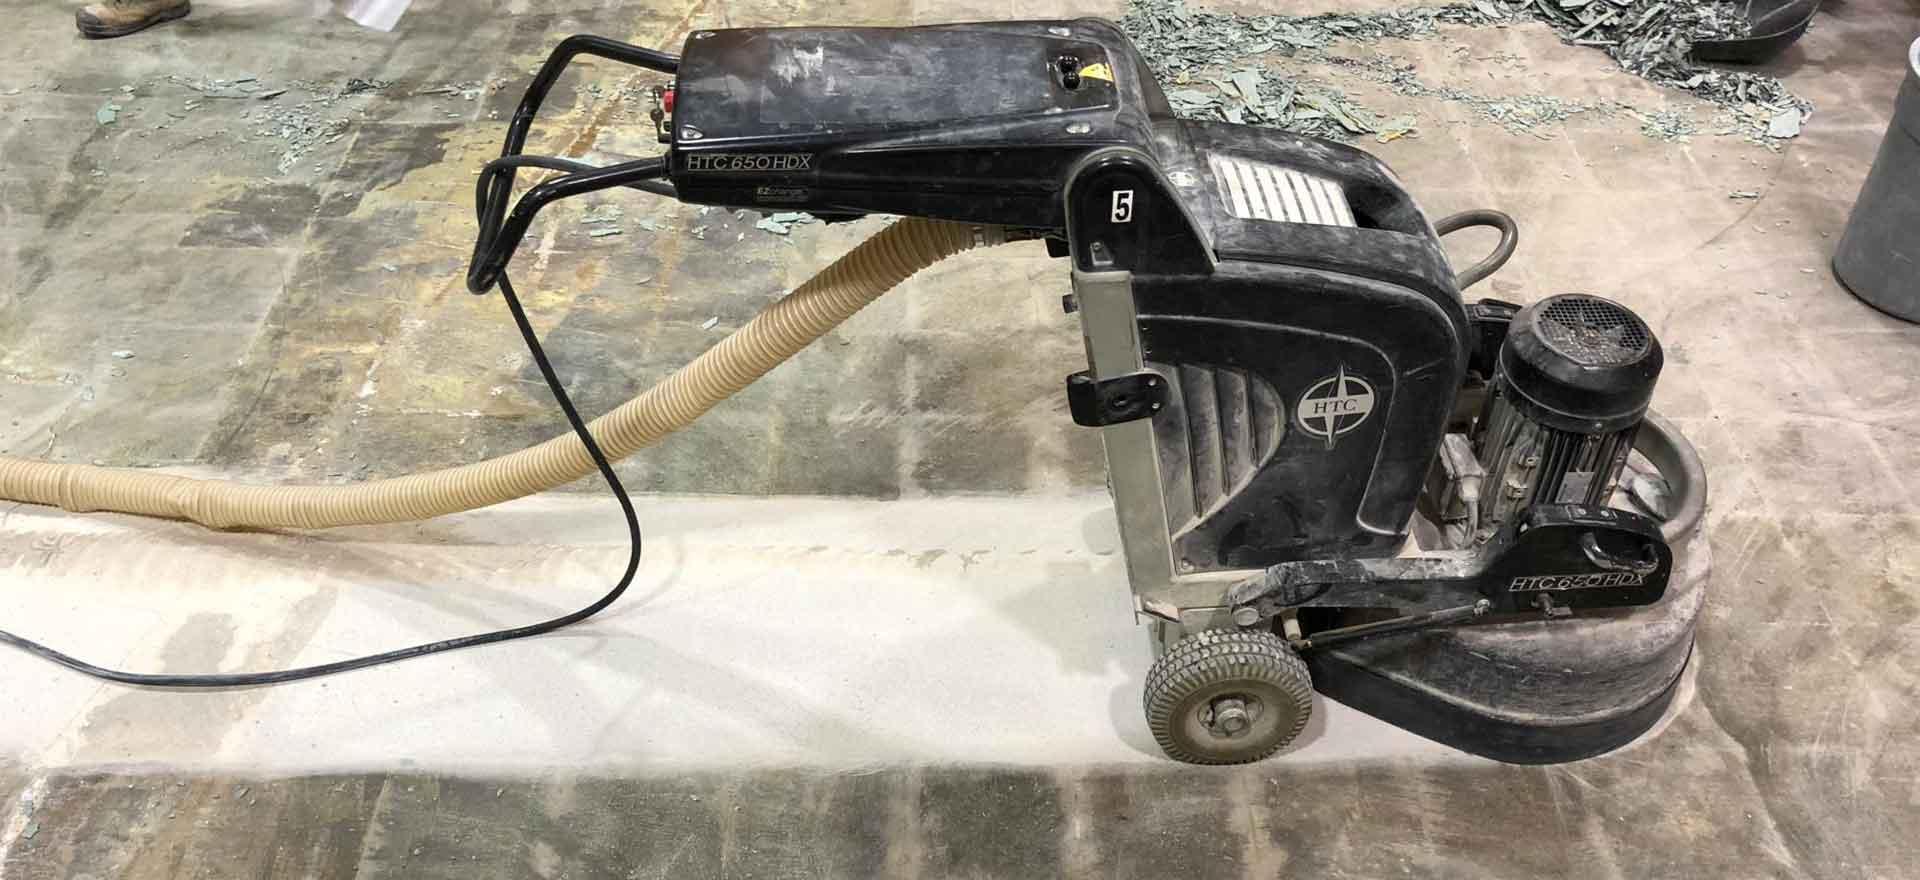 Concrete Prep Glue Grinding